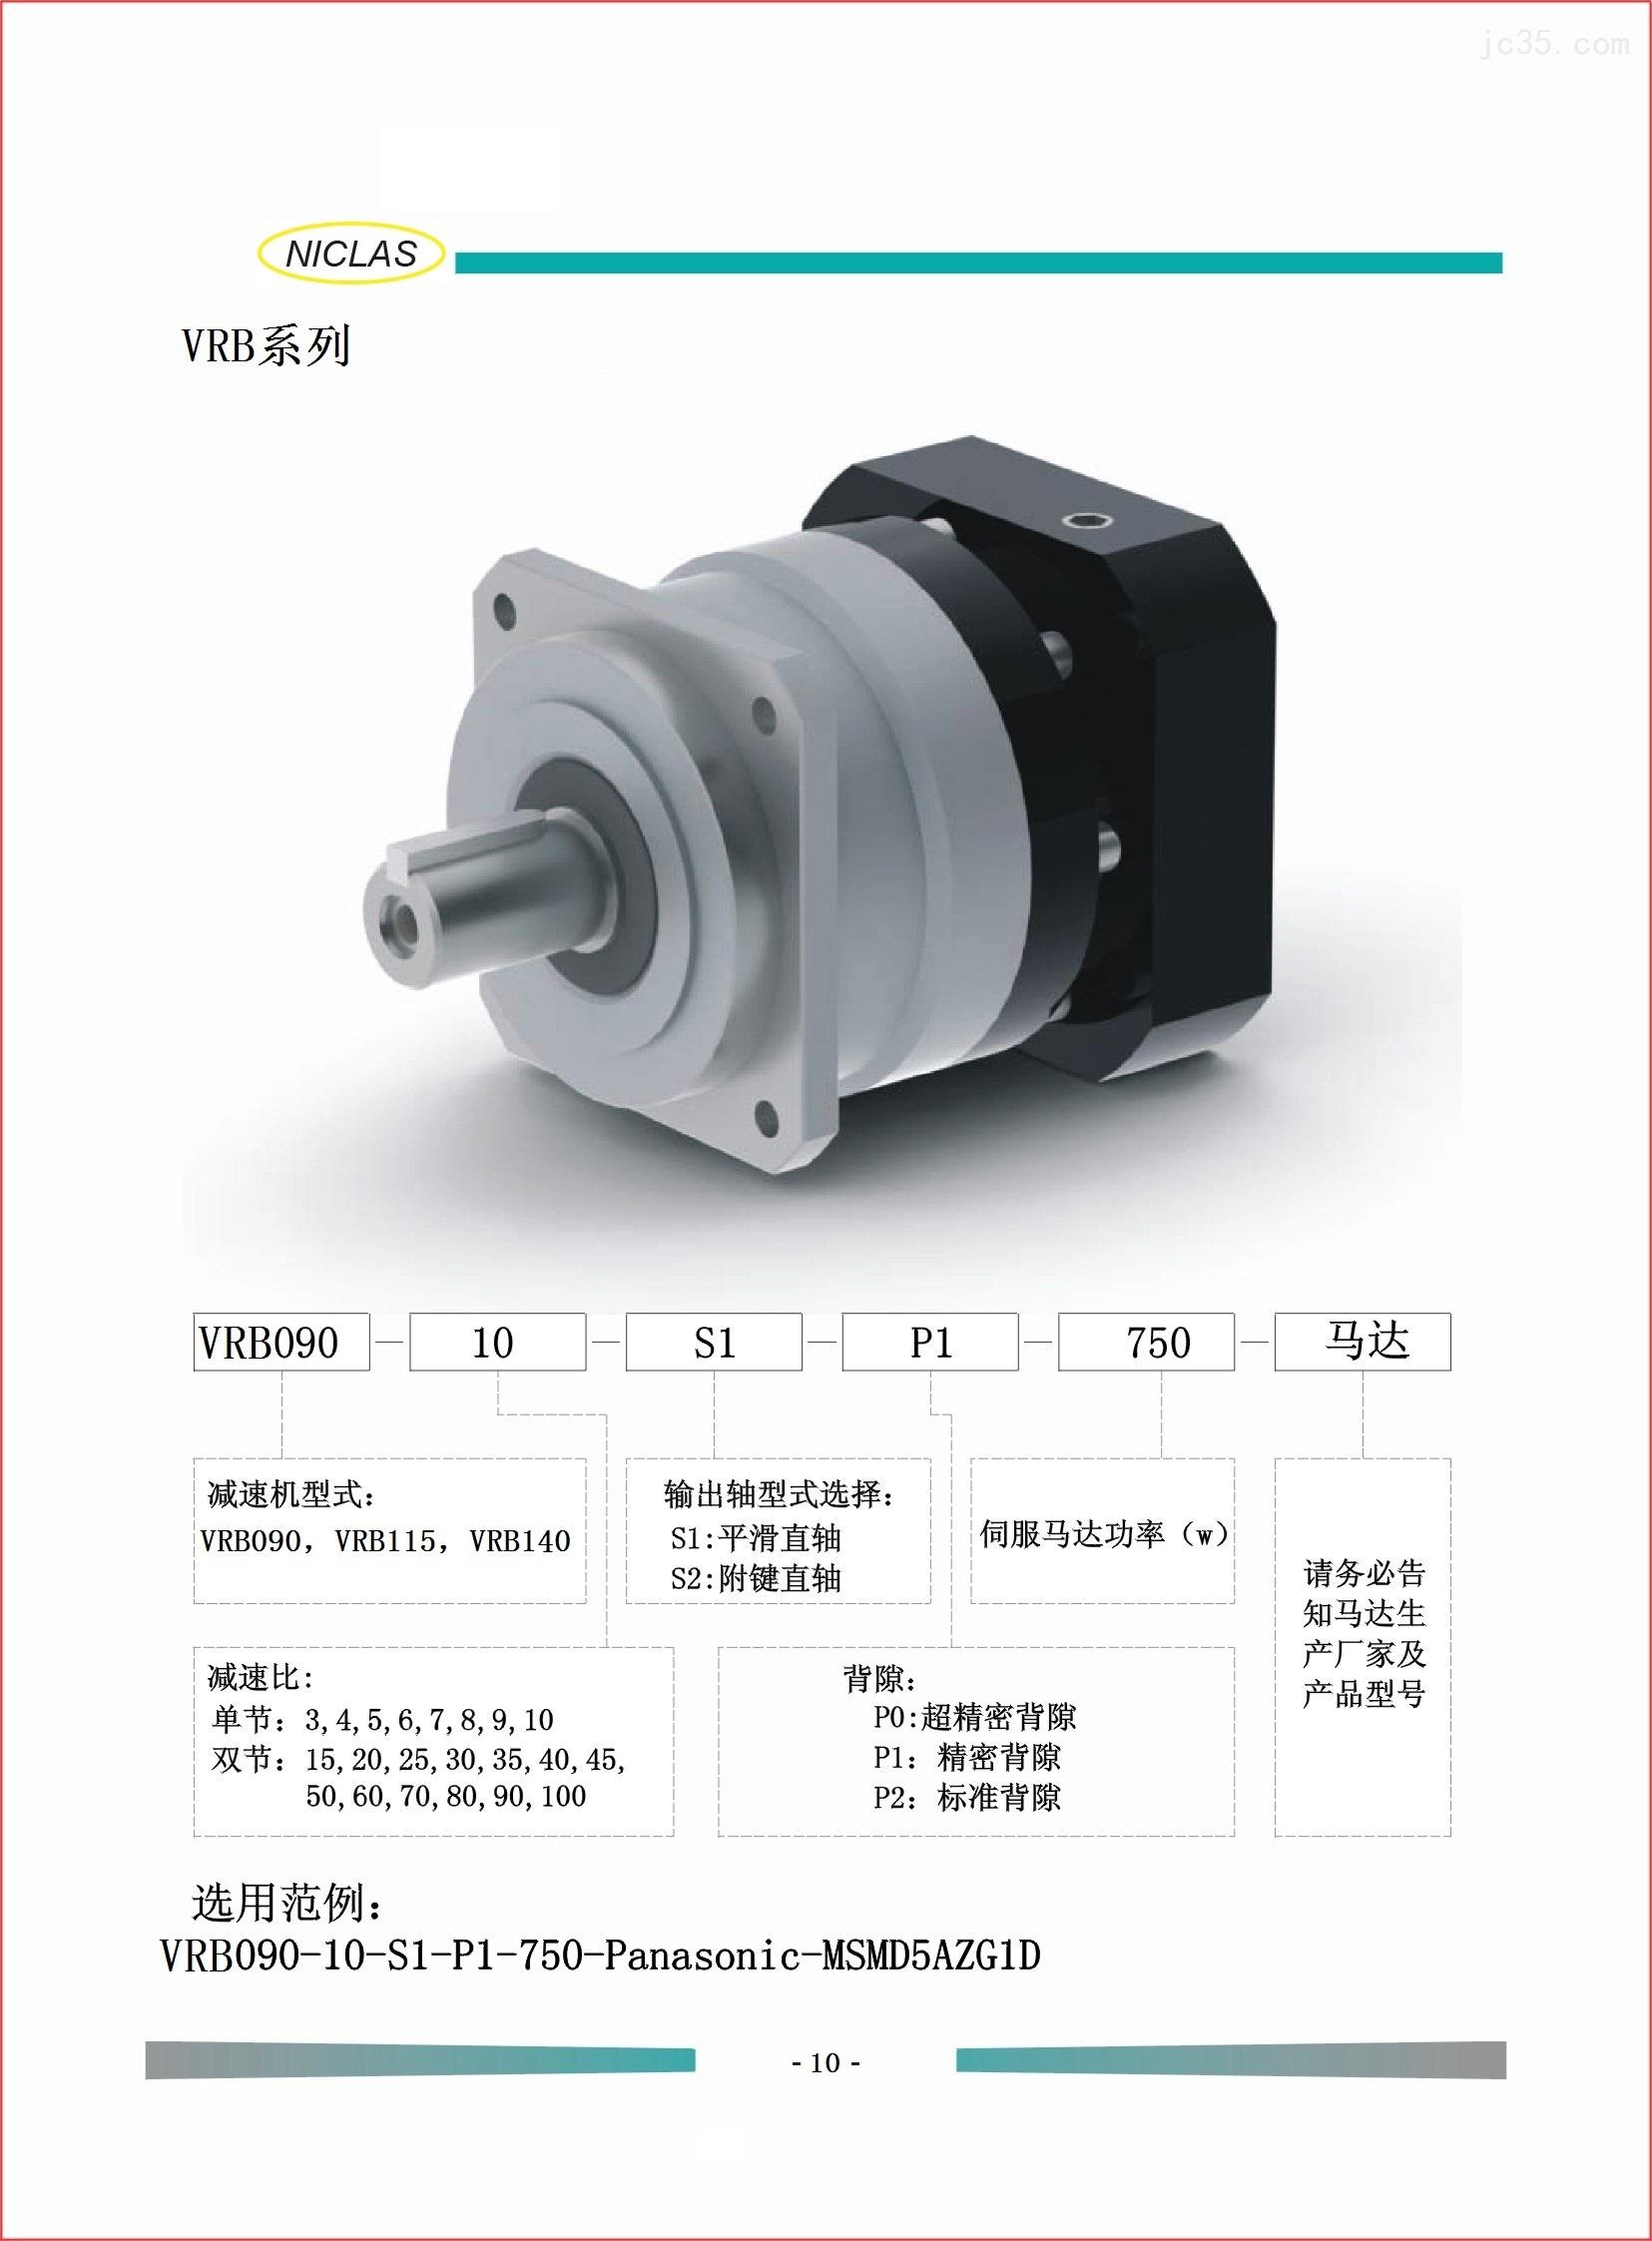 VRB系列斜齿轮3弧分高精度伺服减速机